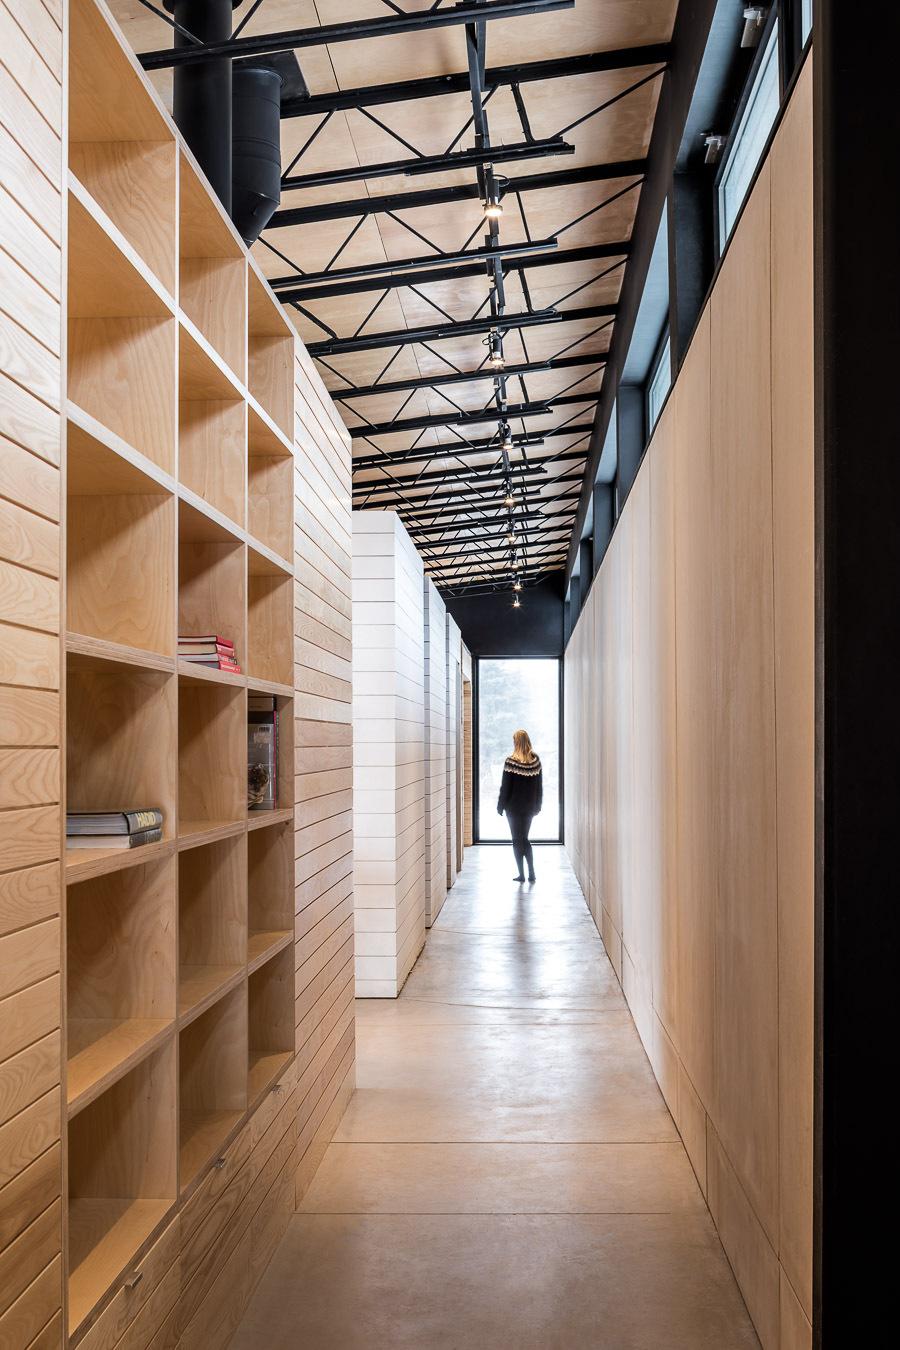 Tall custom shelves in wood shape the interior